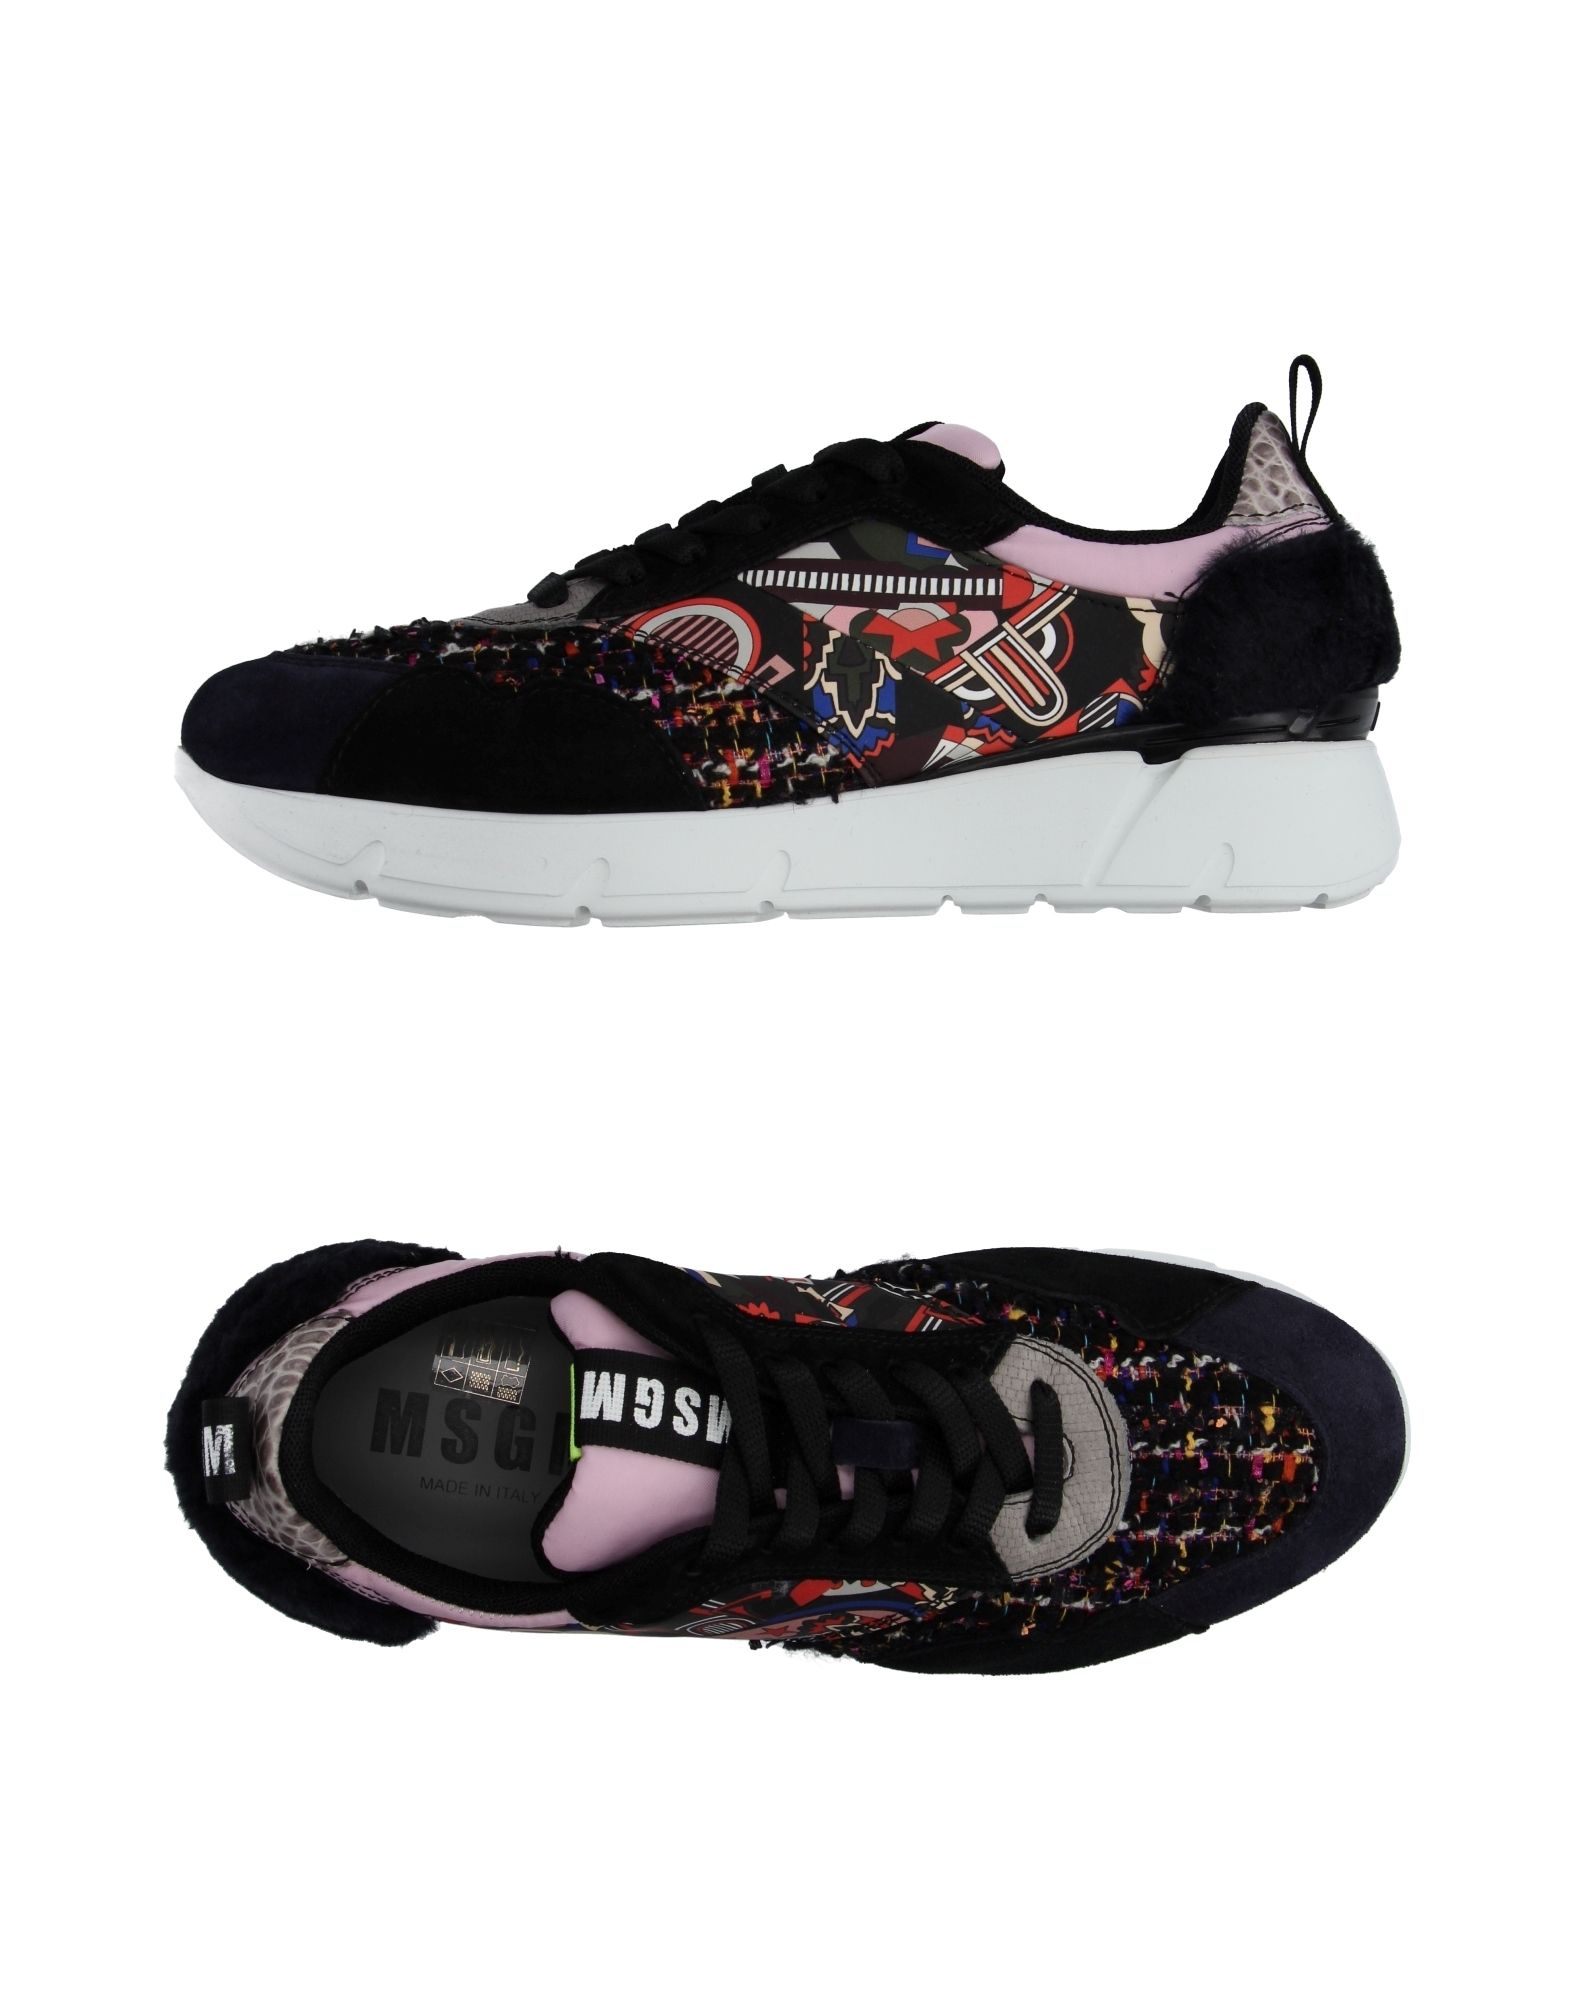 Msgm 11037235HW Sneakers Damen  11037235HW Msgm Gute Qualität beliebte Schuhe c26183